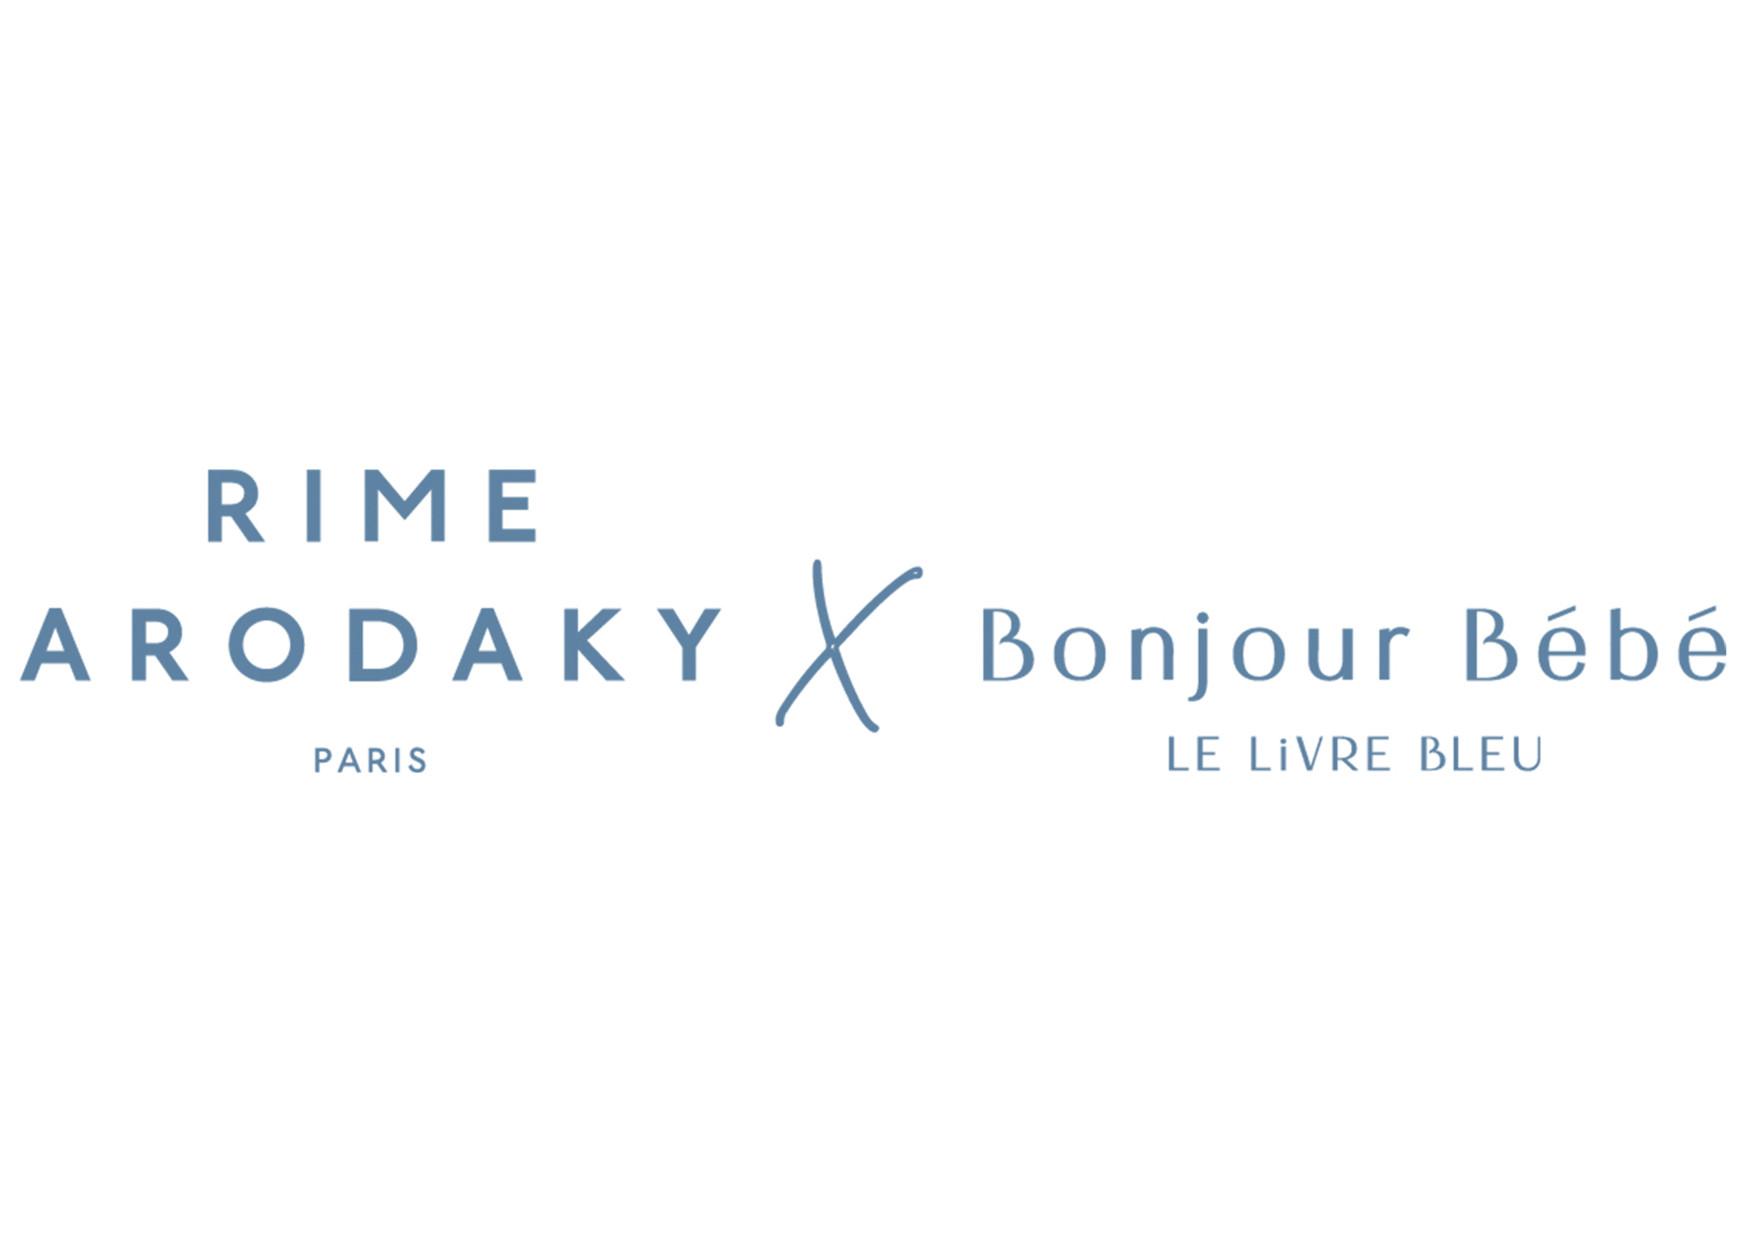 Rime Arodaky X Bonjour Bébé